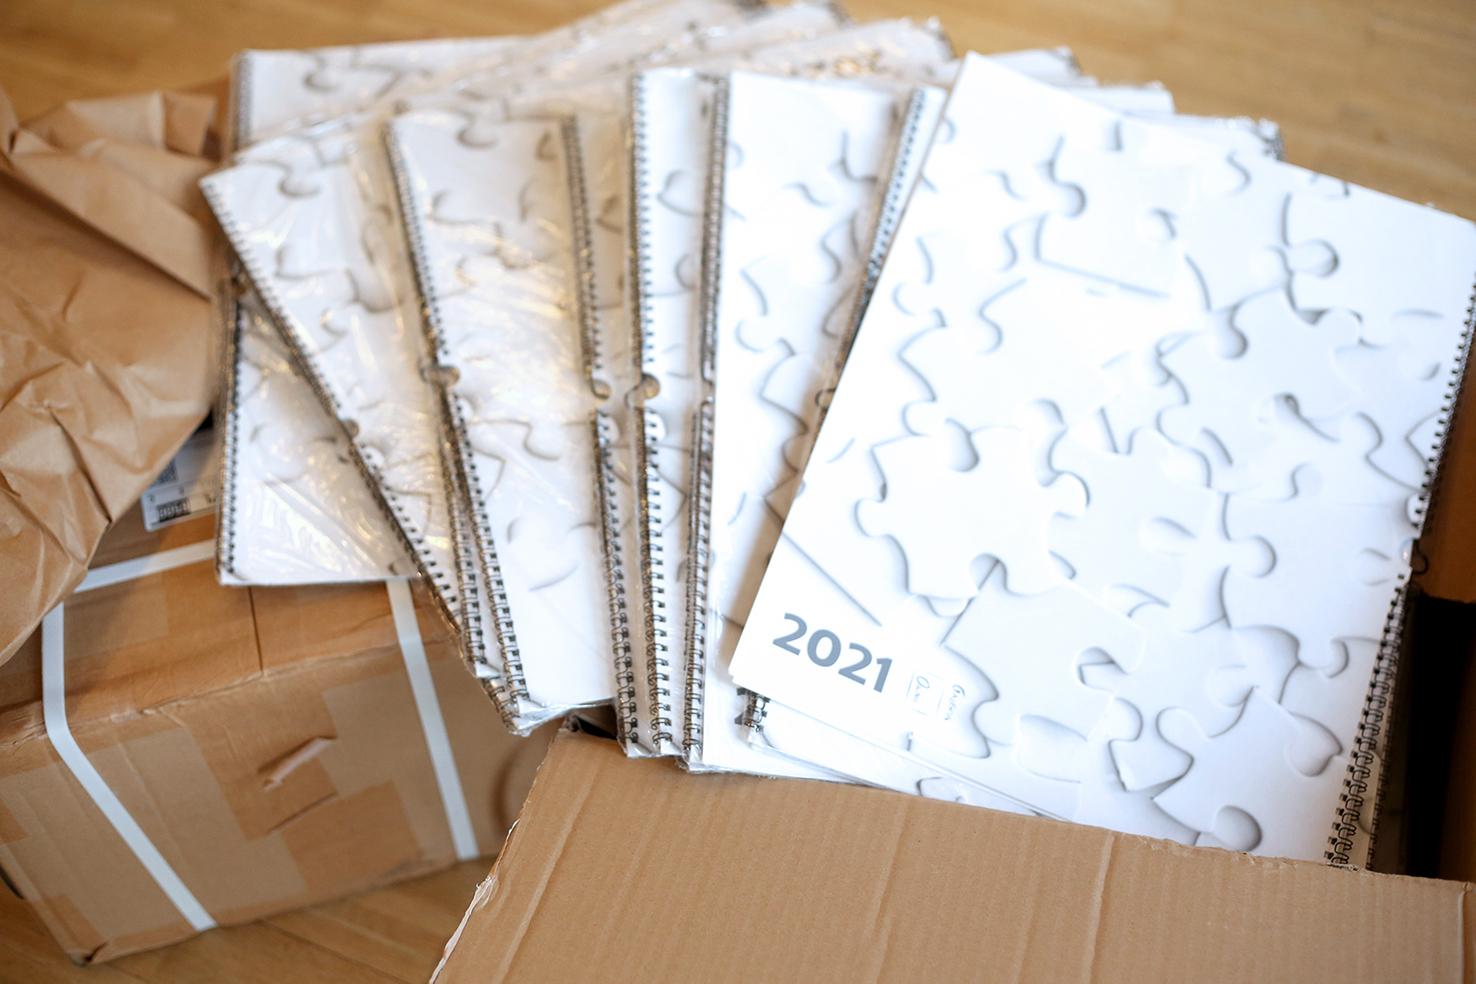 Limitowany kalendarz Galerii OKNO na 2021 rok